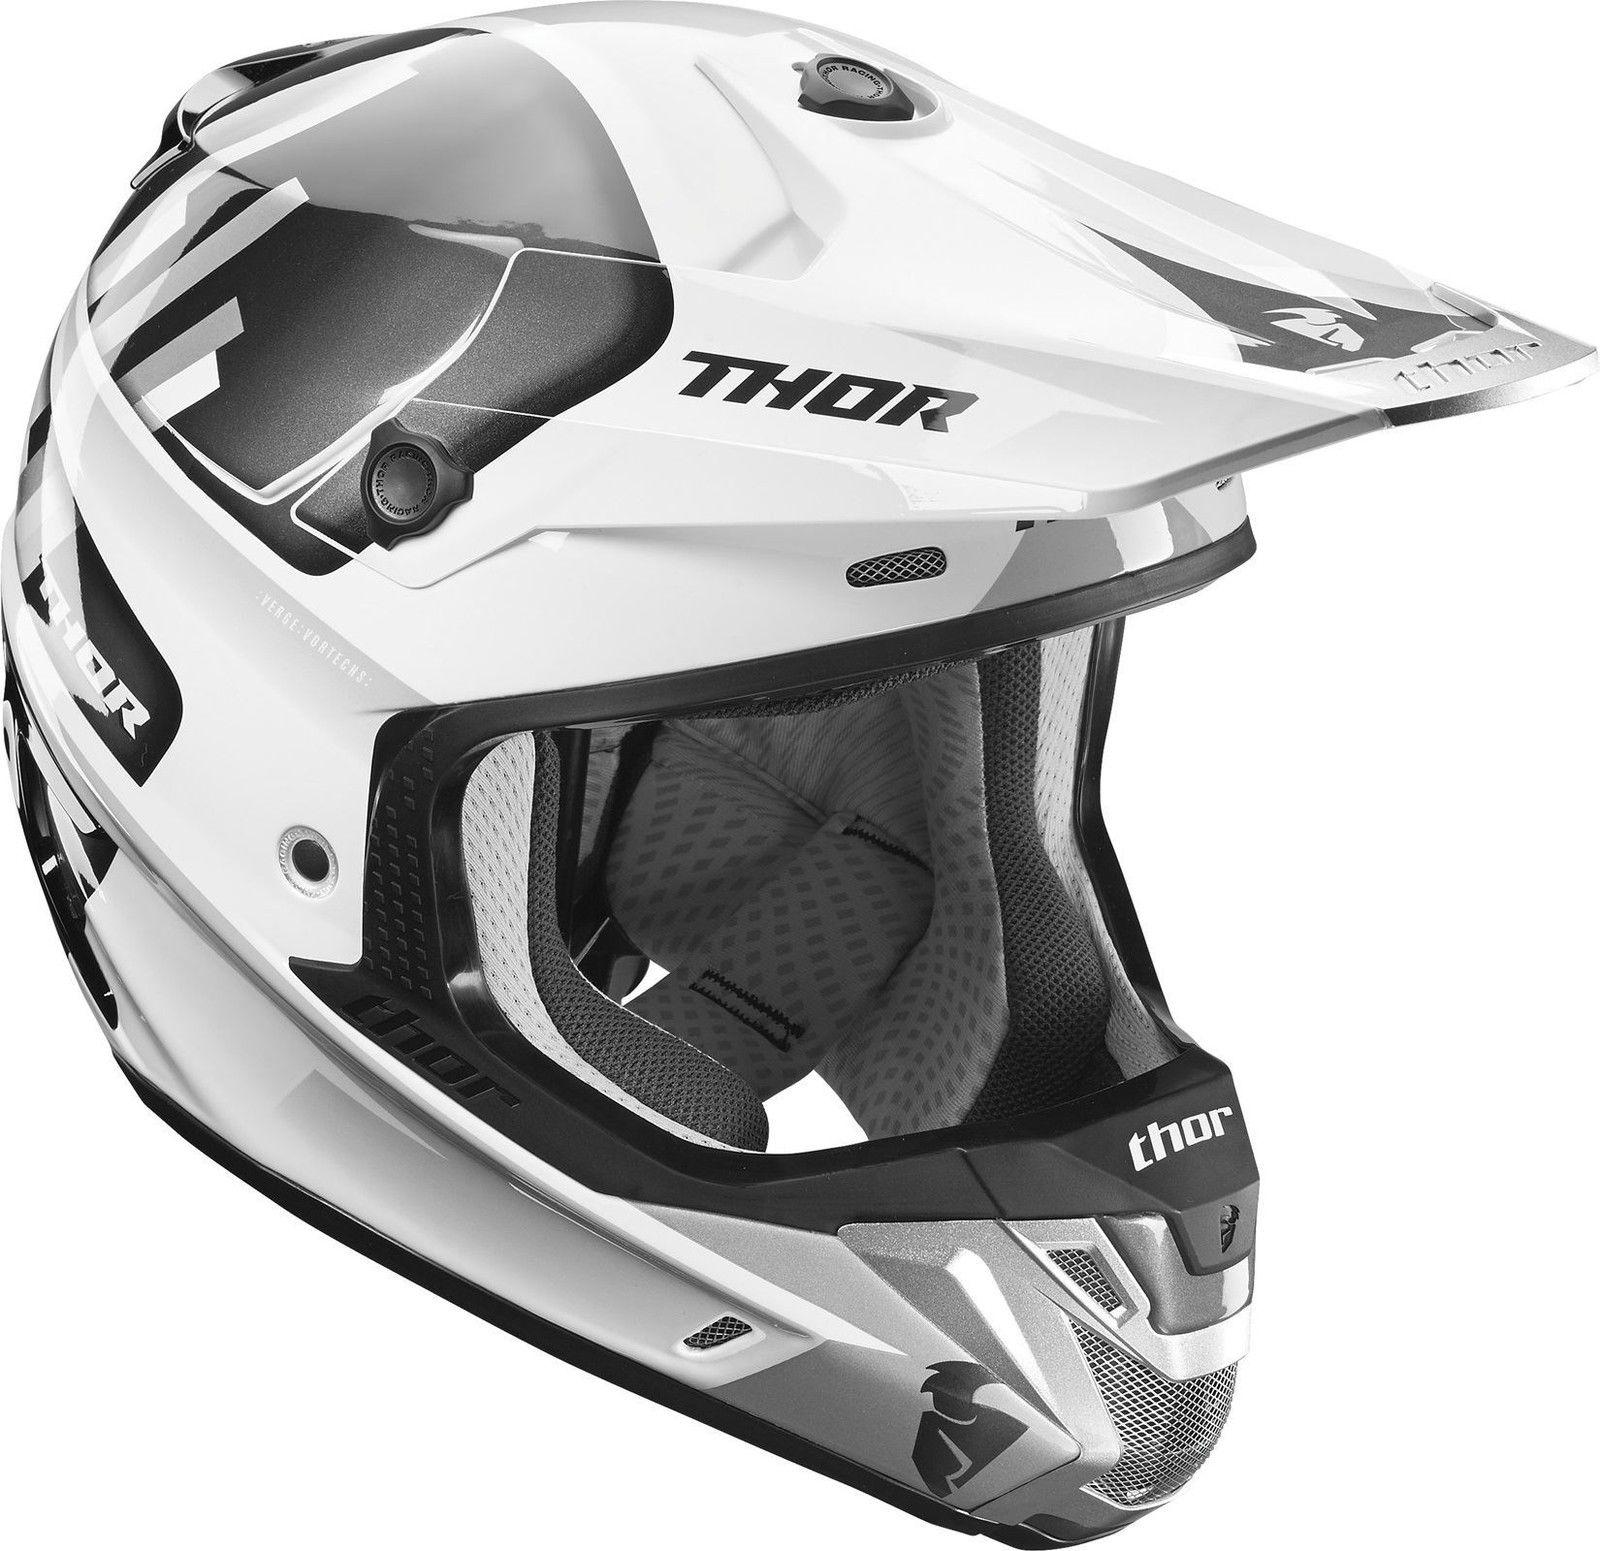 ce2baeb1 2017 Thor MX Verge Vortechs White/Grey Motocross Helmet | Grips Bikes